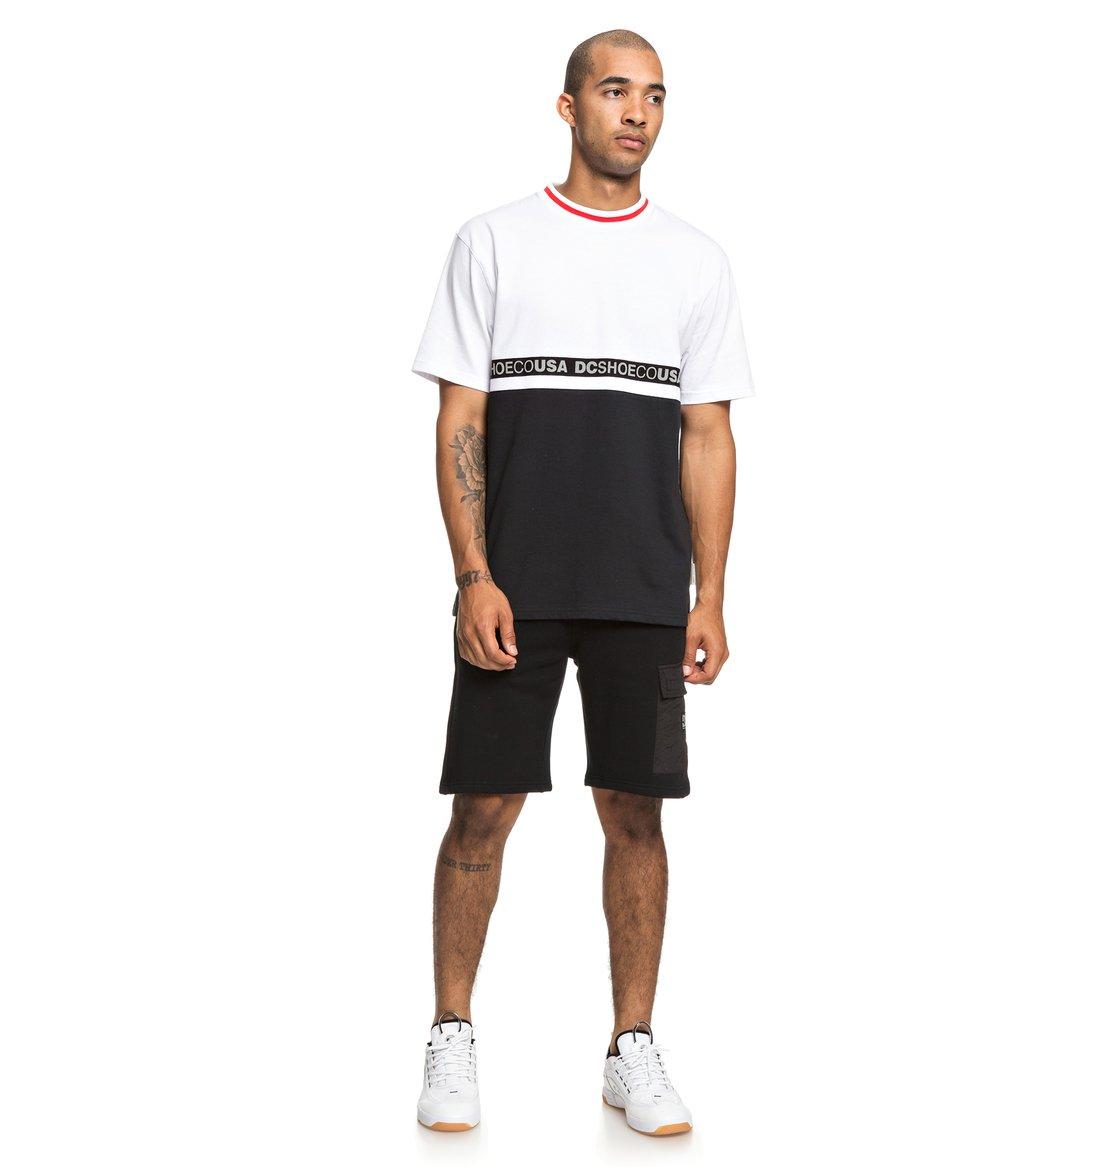 T-Shirt for Men EDYKT03441 DC Shoes™ Walkley